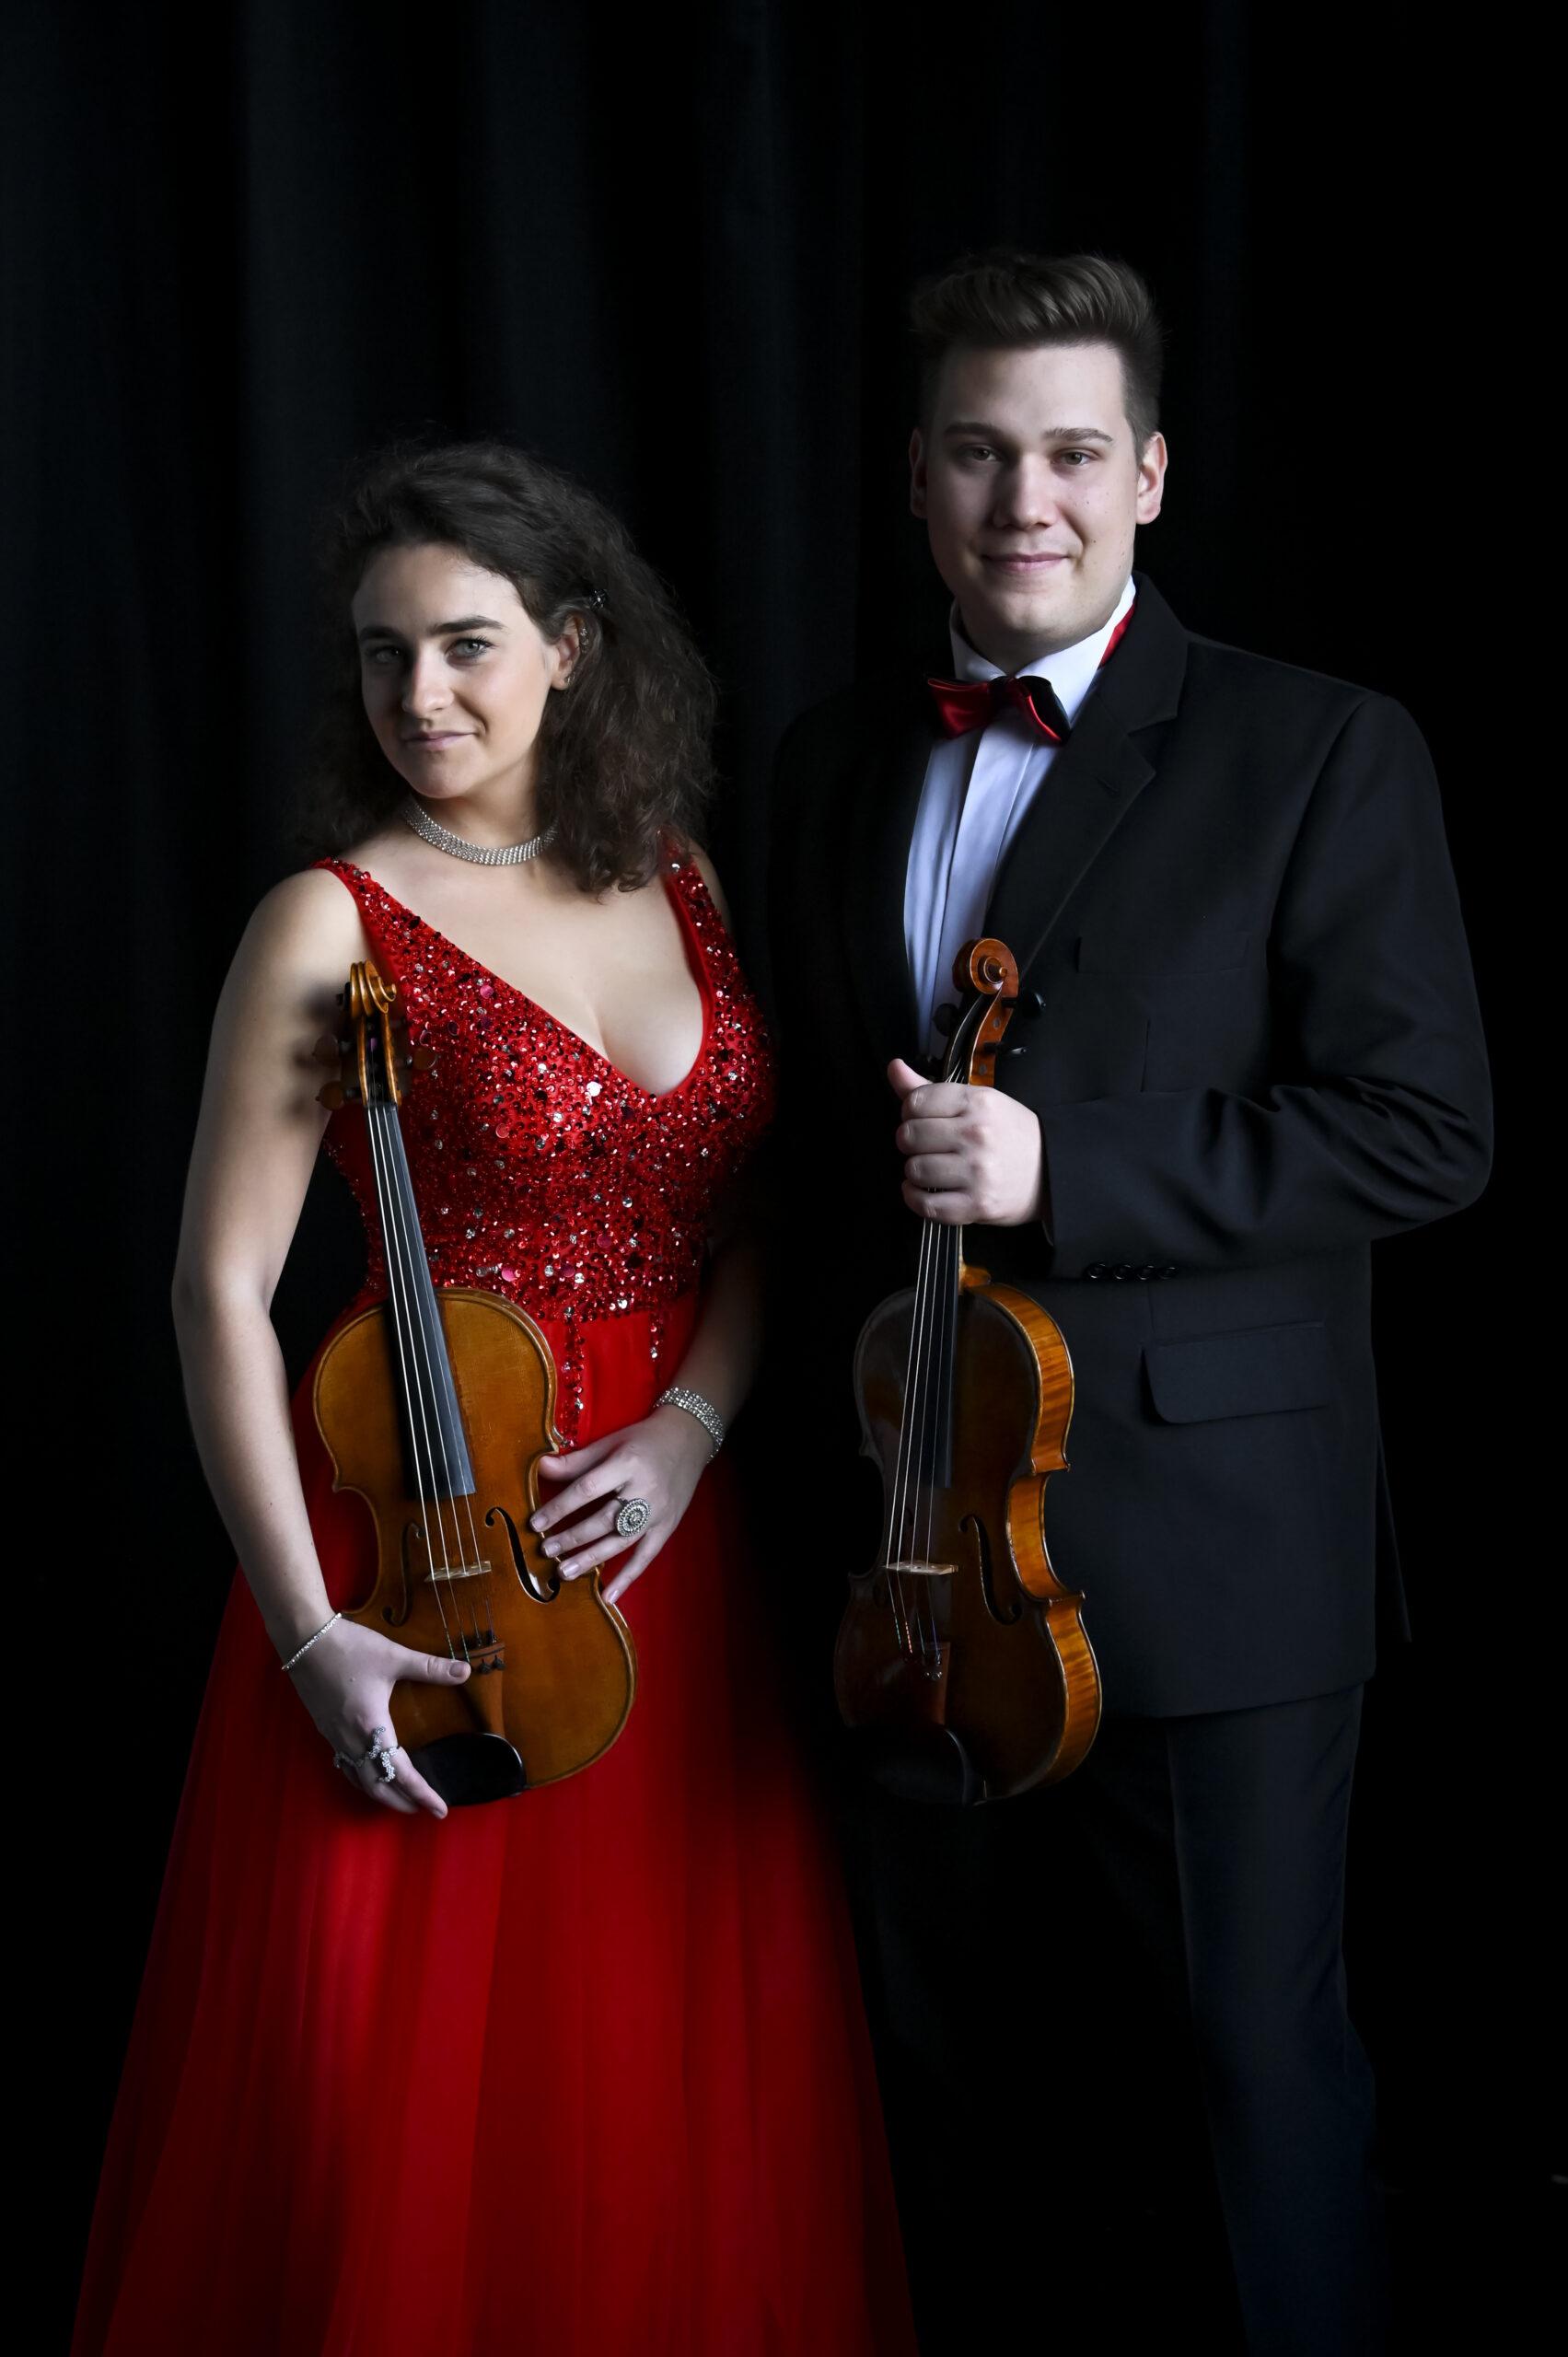 Polish Violin Duo (skrzypce)